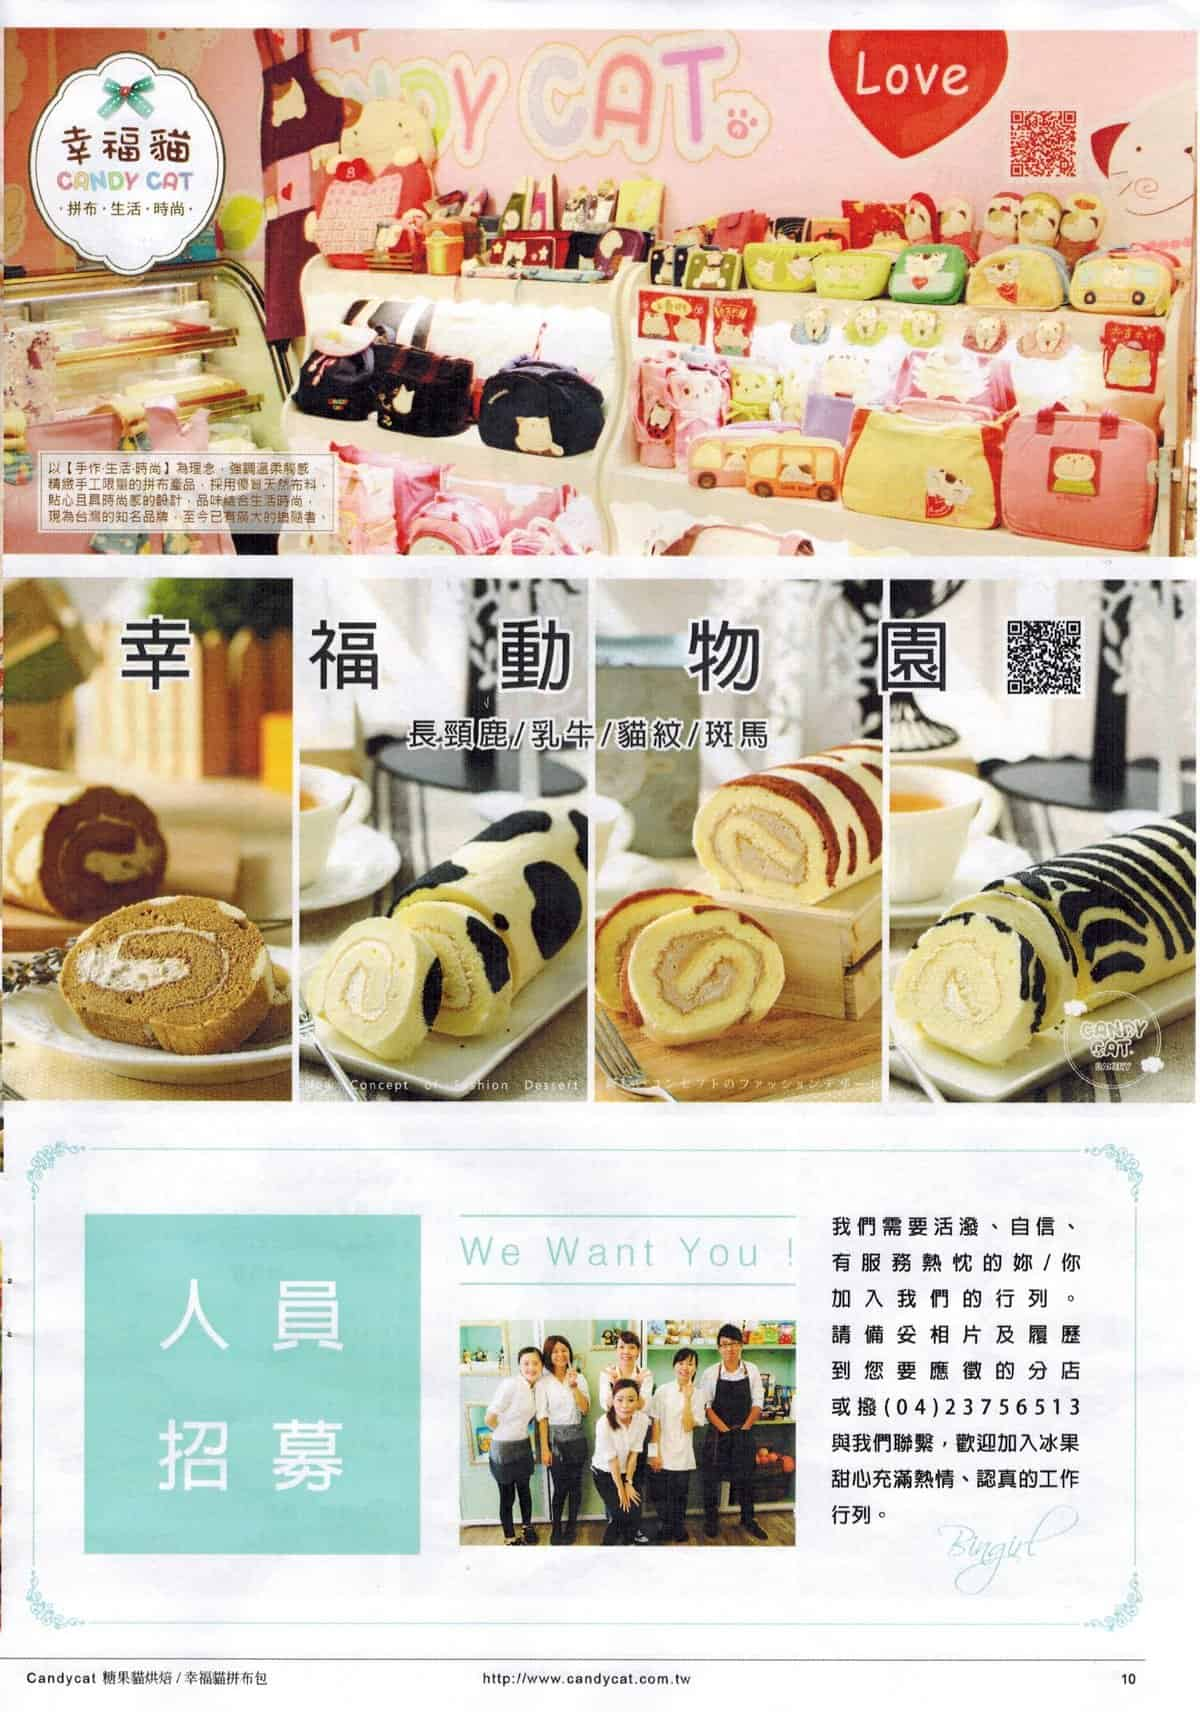 taipei-bingirl-menu11